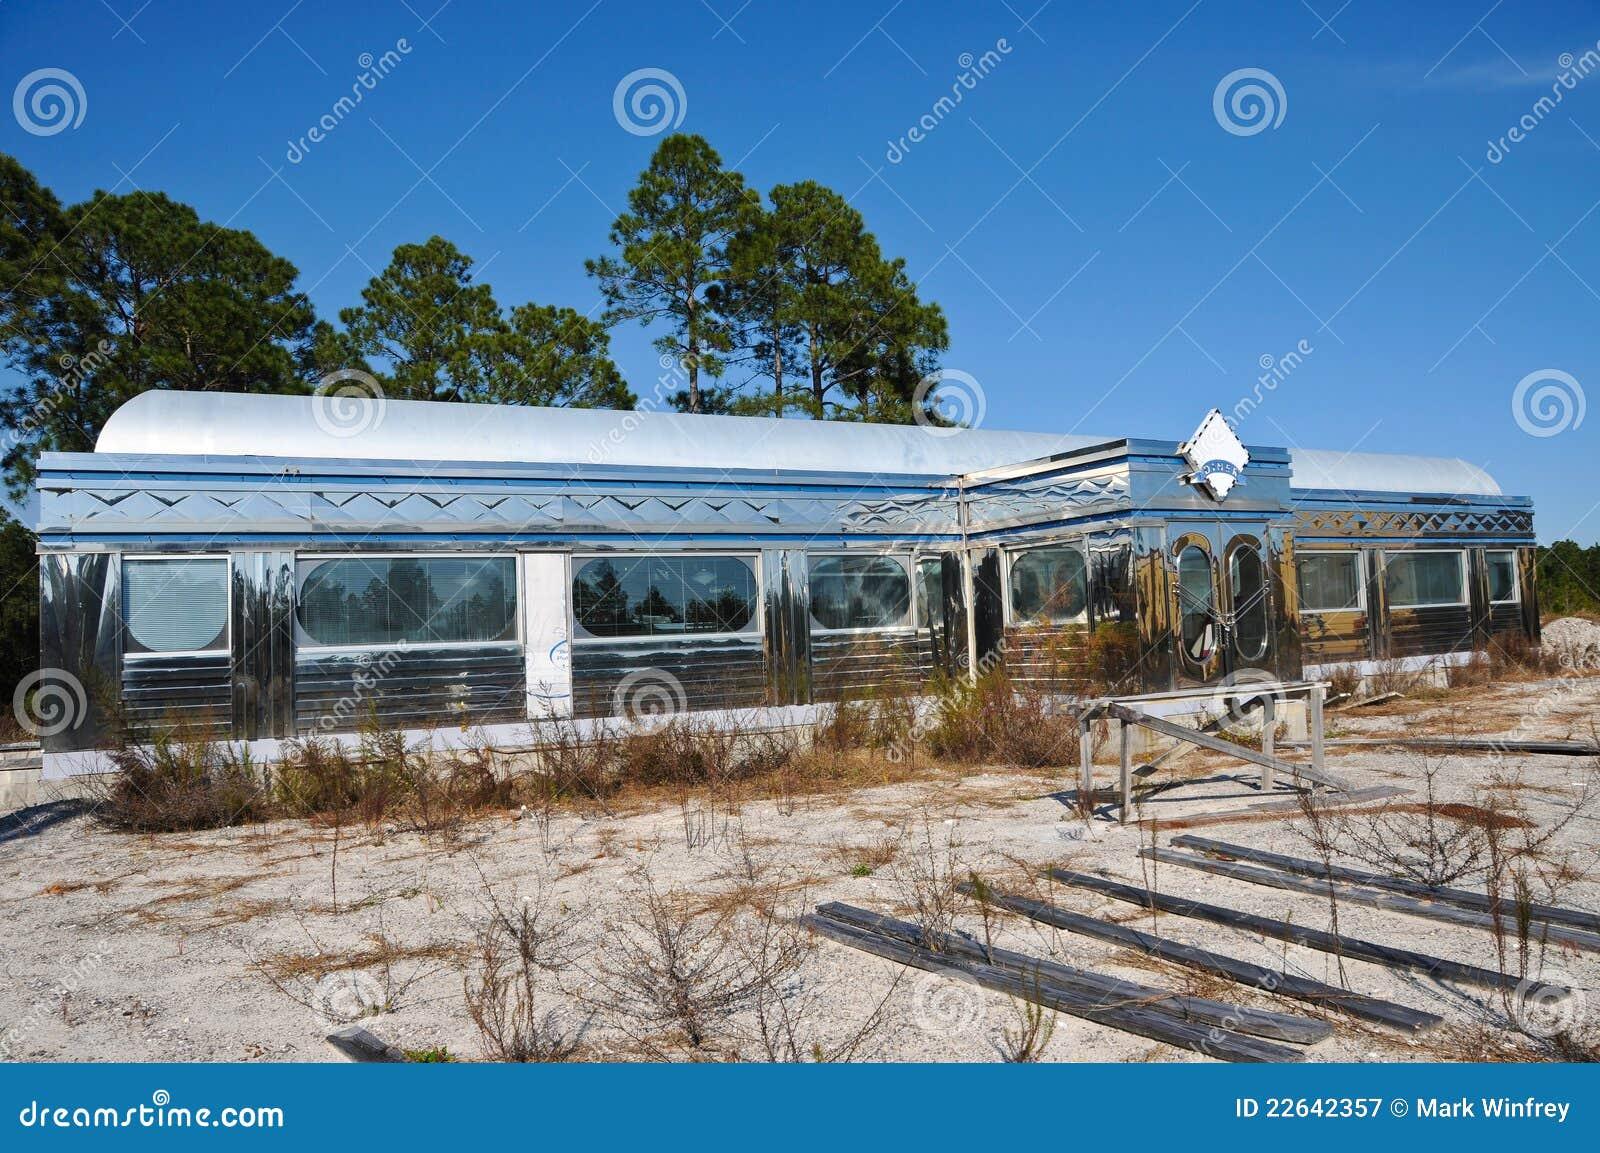 Wagon-restaurant